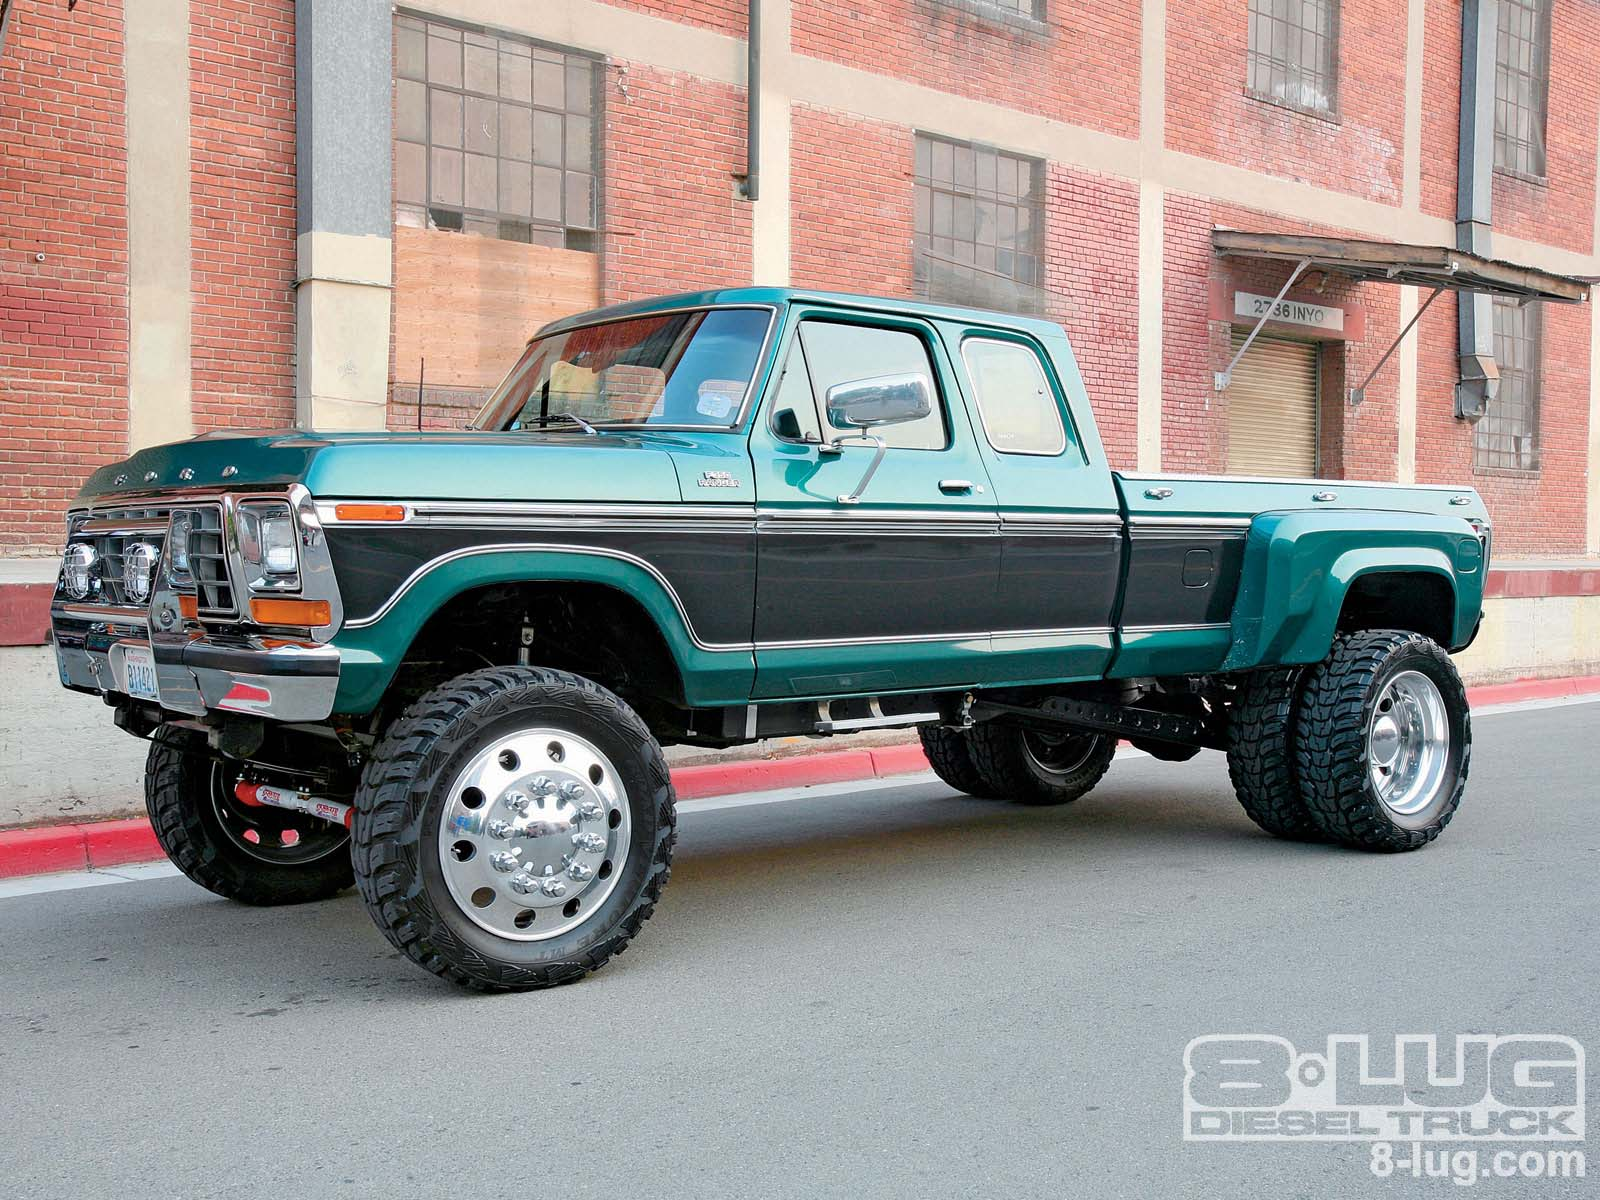 1978 Ford Dually Pickup Custom Diesel Trucks 8 Lug Magazine